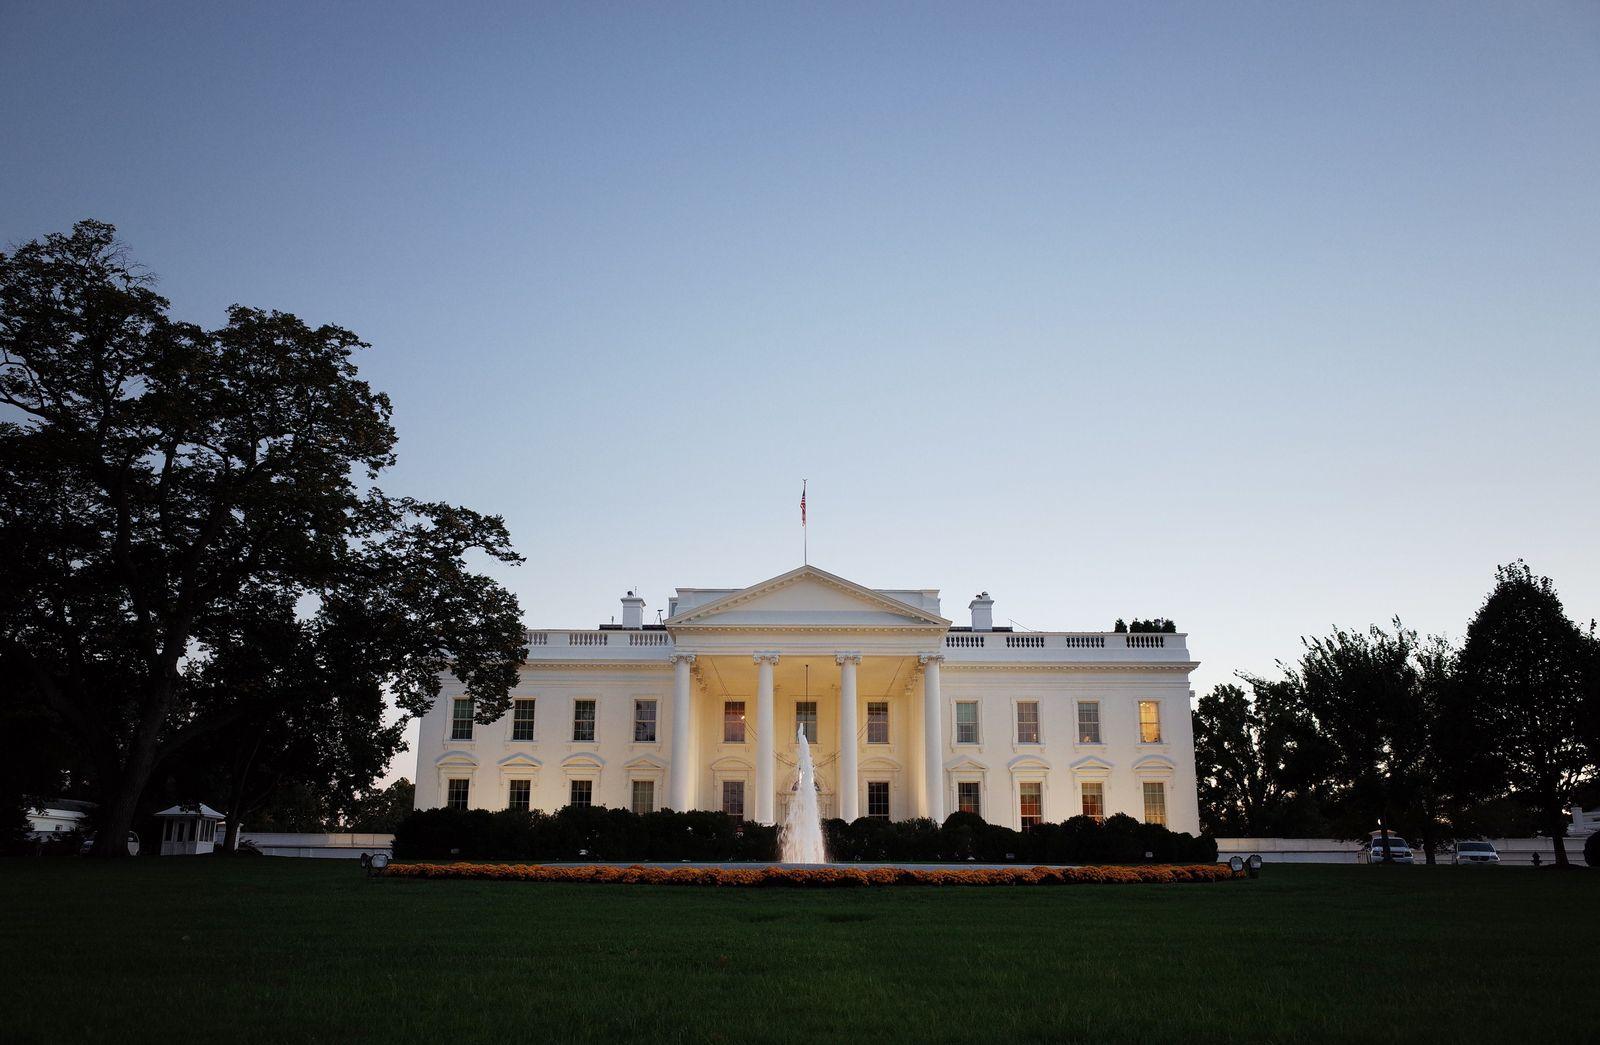 US-POLITICS-FEATURE-WHITE HOUSE